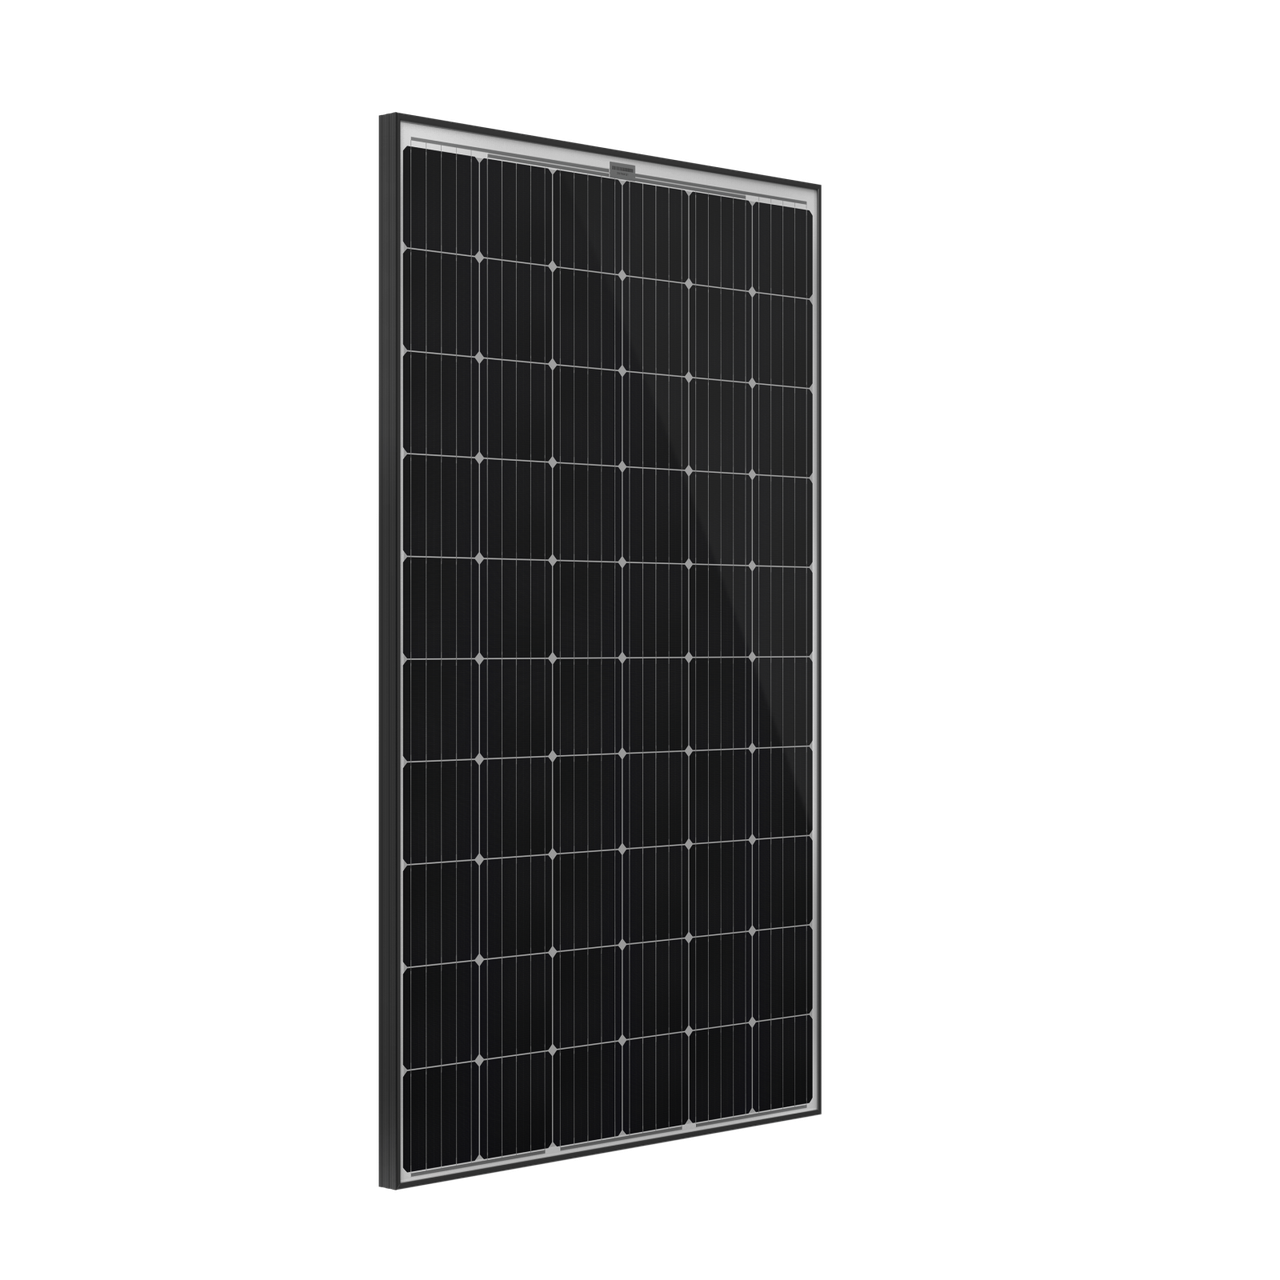 Сонячна батарея Leapton LP60-315M PERC 5BB, 315 Вт (монокристал)